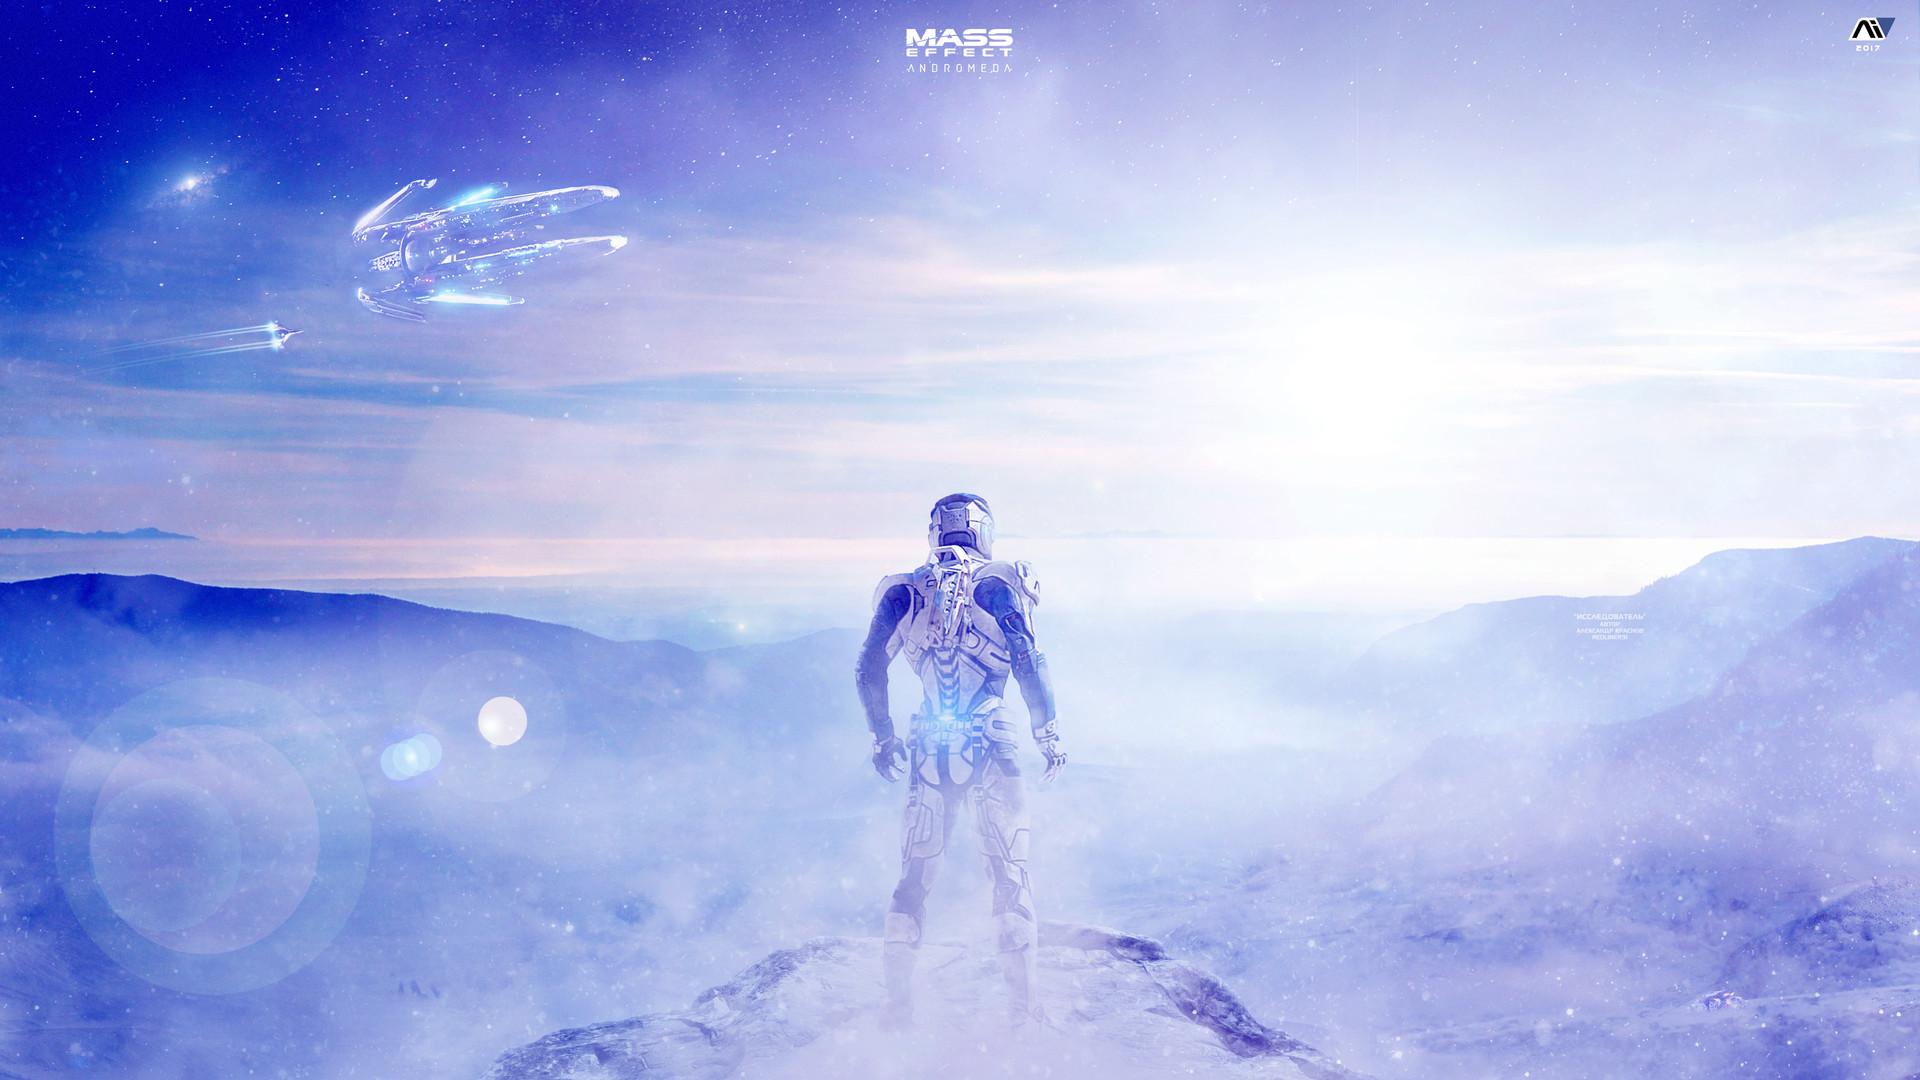 Alexander Krasnov Explorer Mass Effect Andromeda 4k